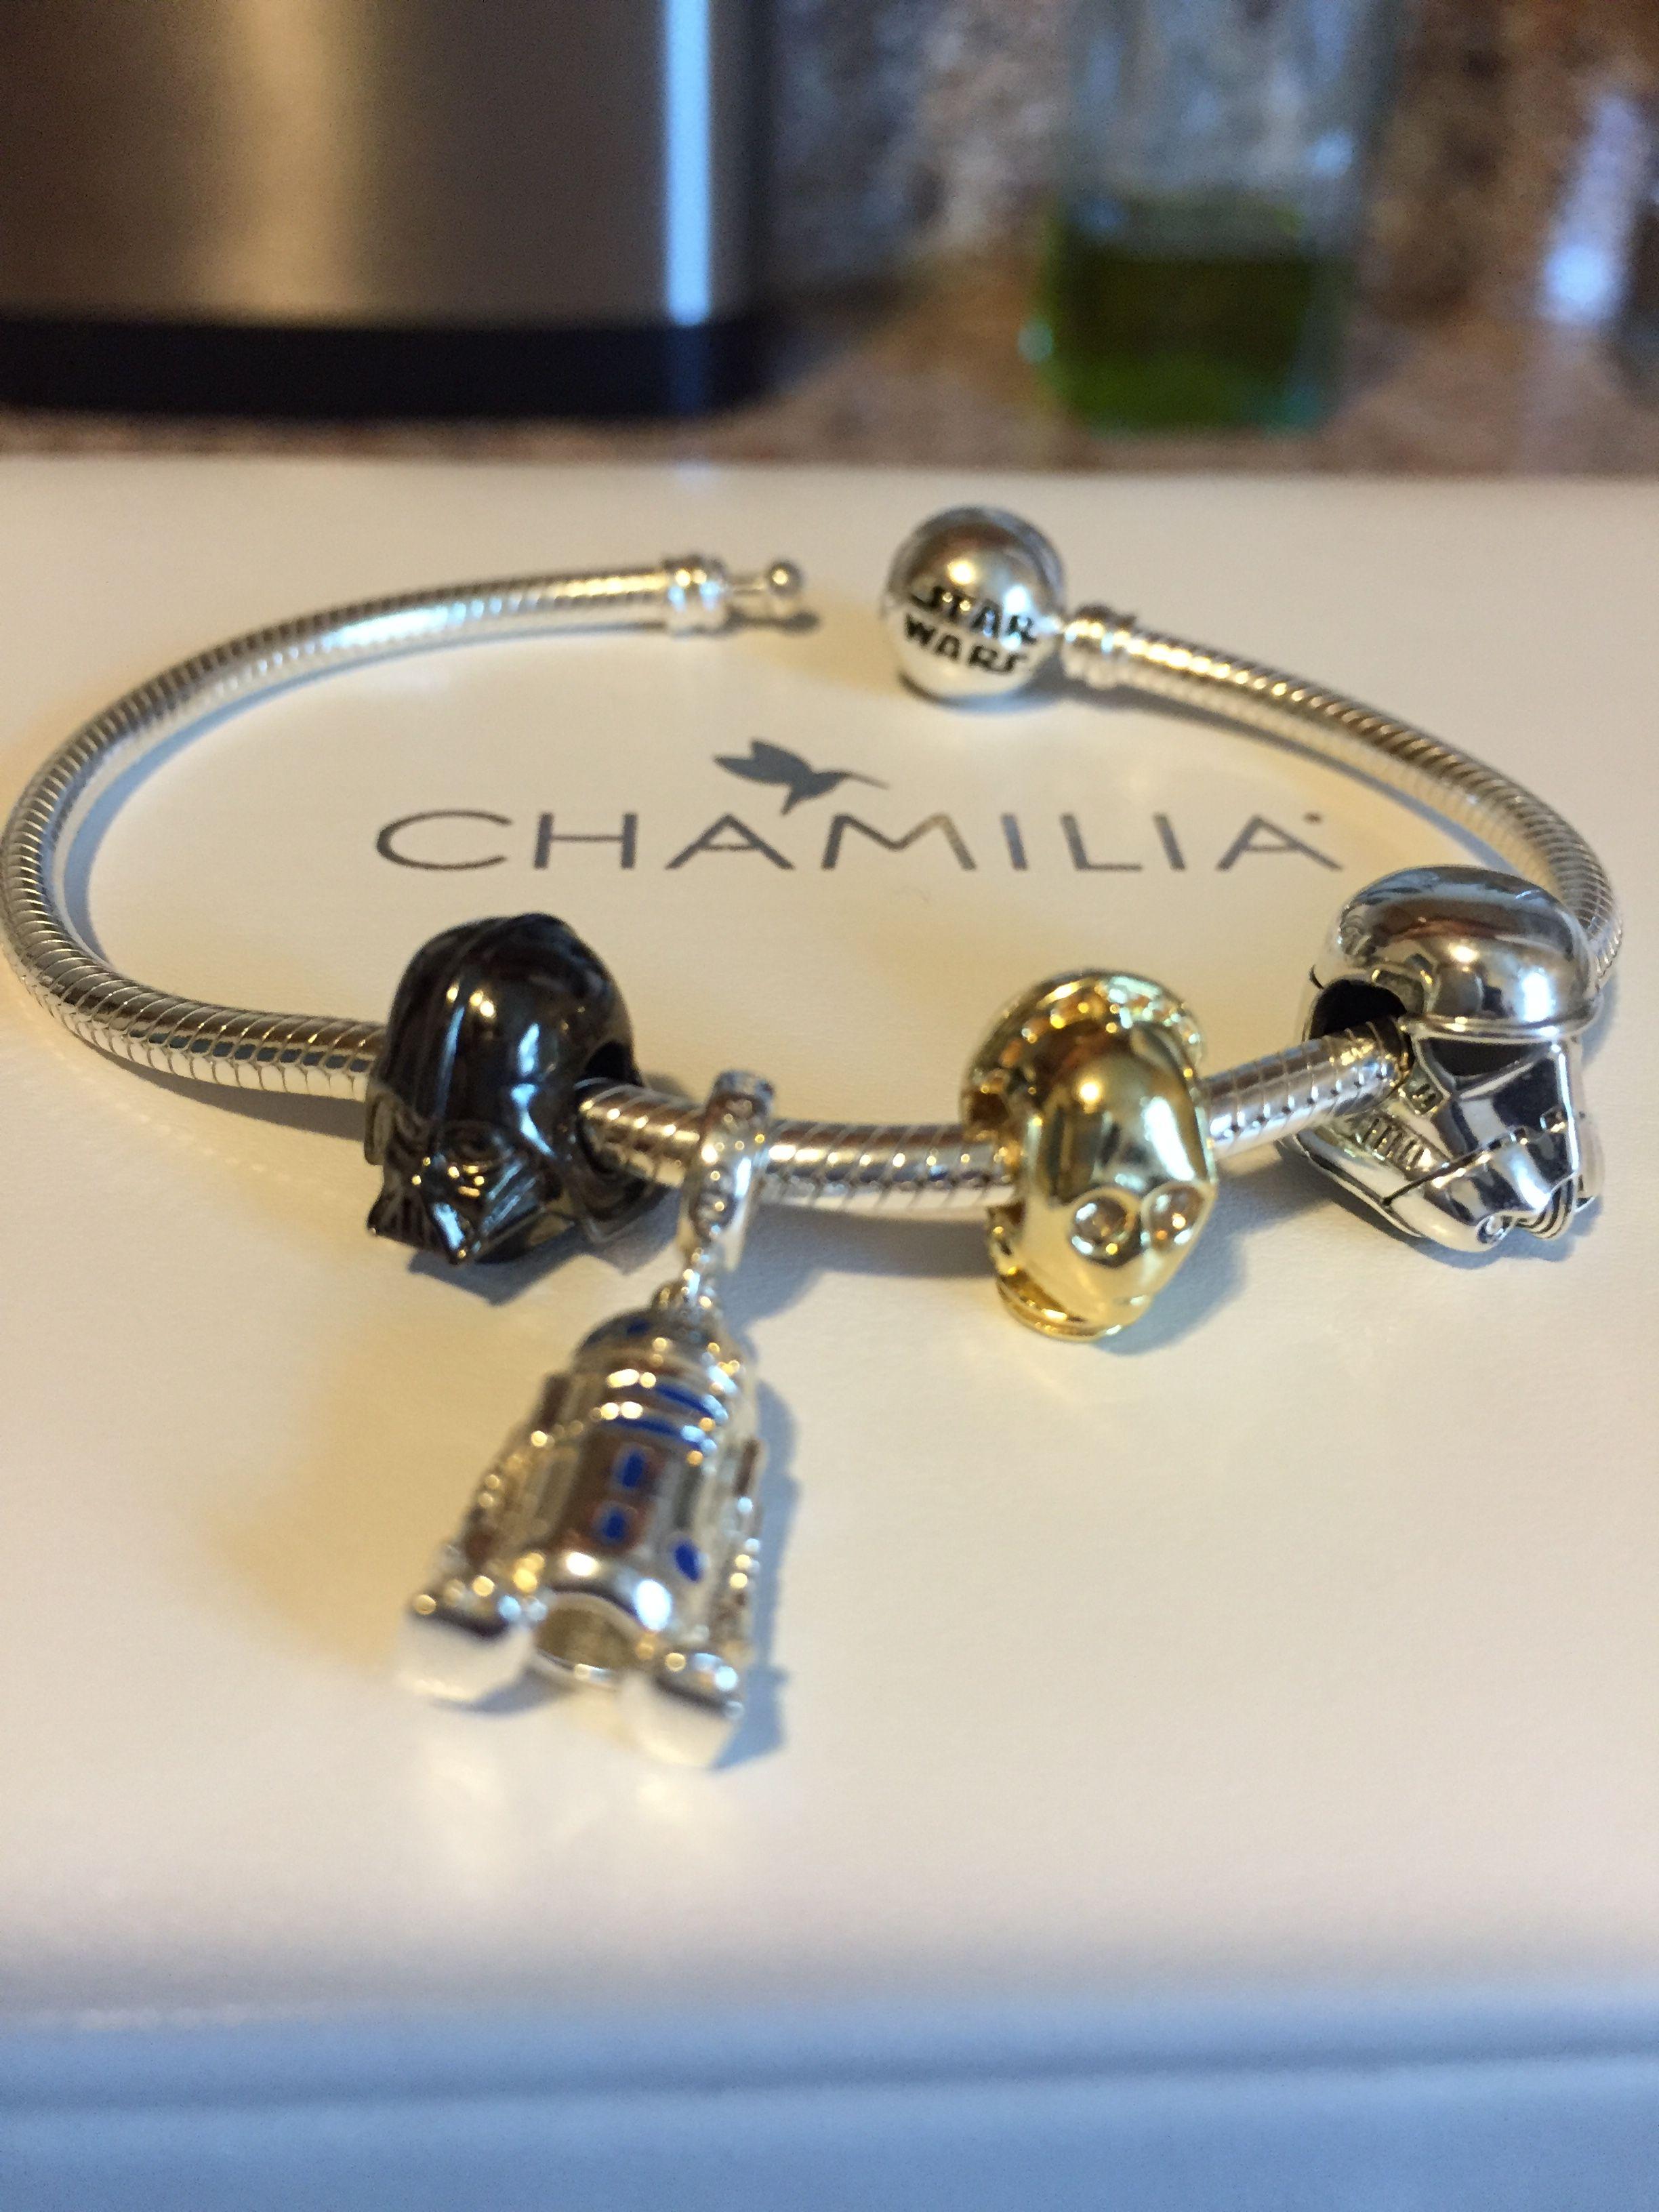 1c80dba5789d4 Chamilia Star Wars bracelet. Dart Vader, R2D2, C3PO and Storm ...